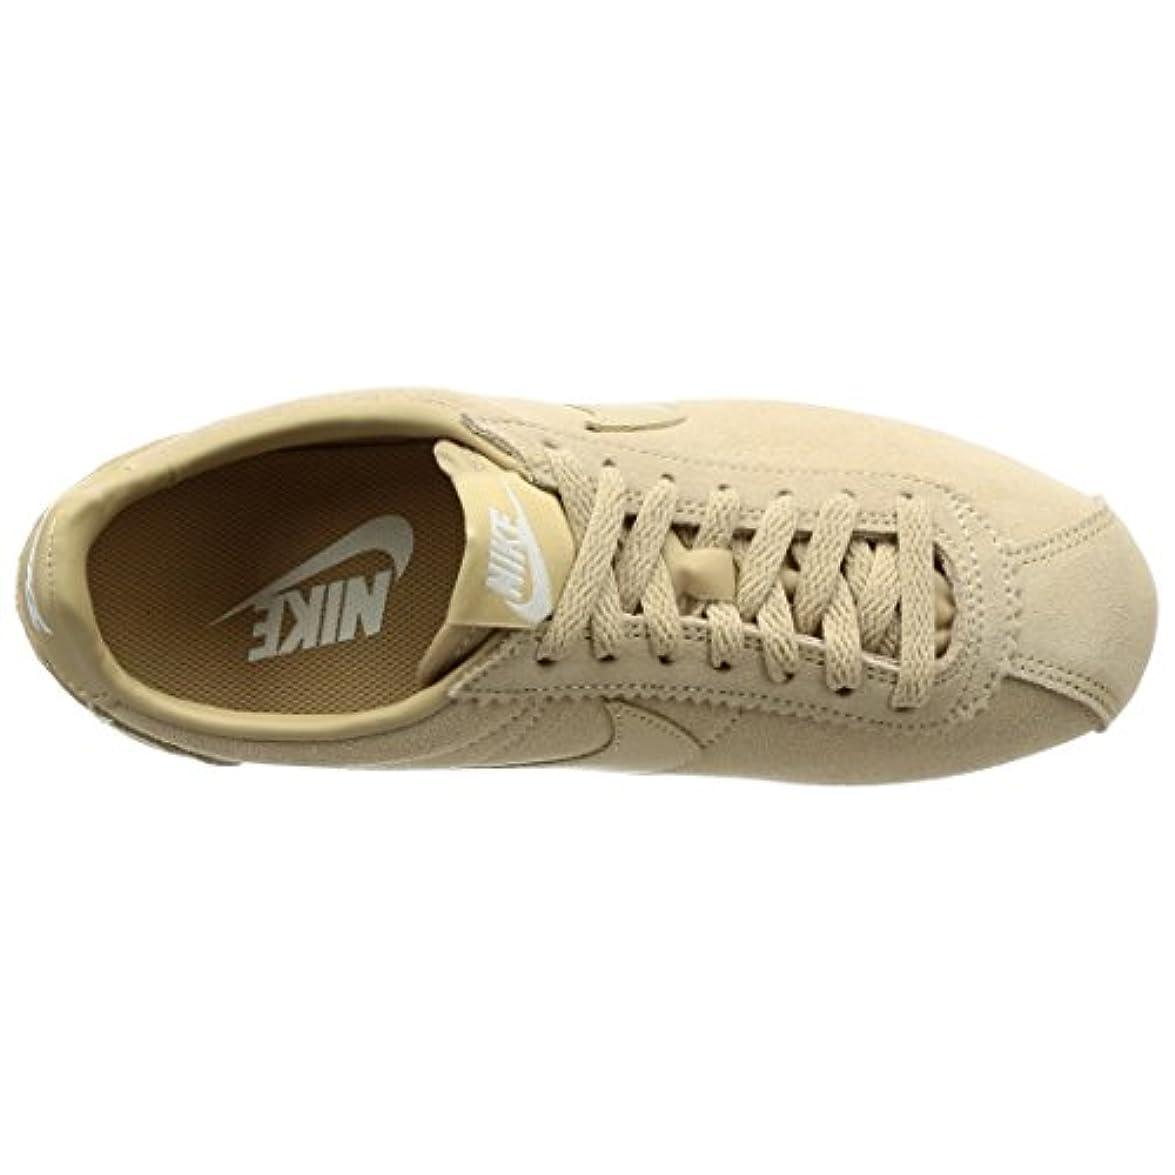 Nike Downshifter 5 Msl Scarpe Da Corsa Uomo Nero Schwarz hellblau